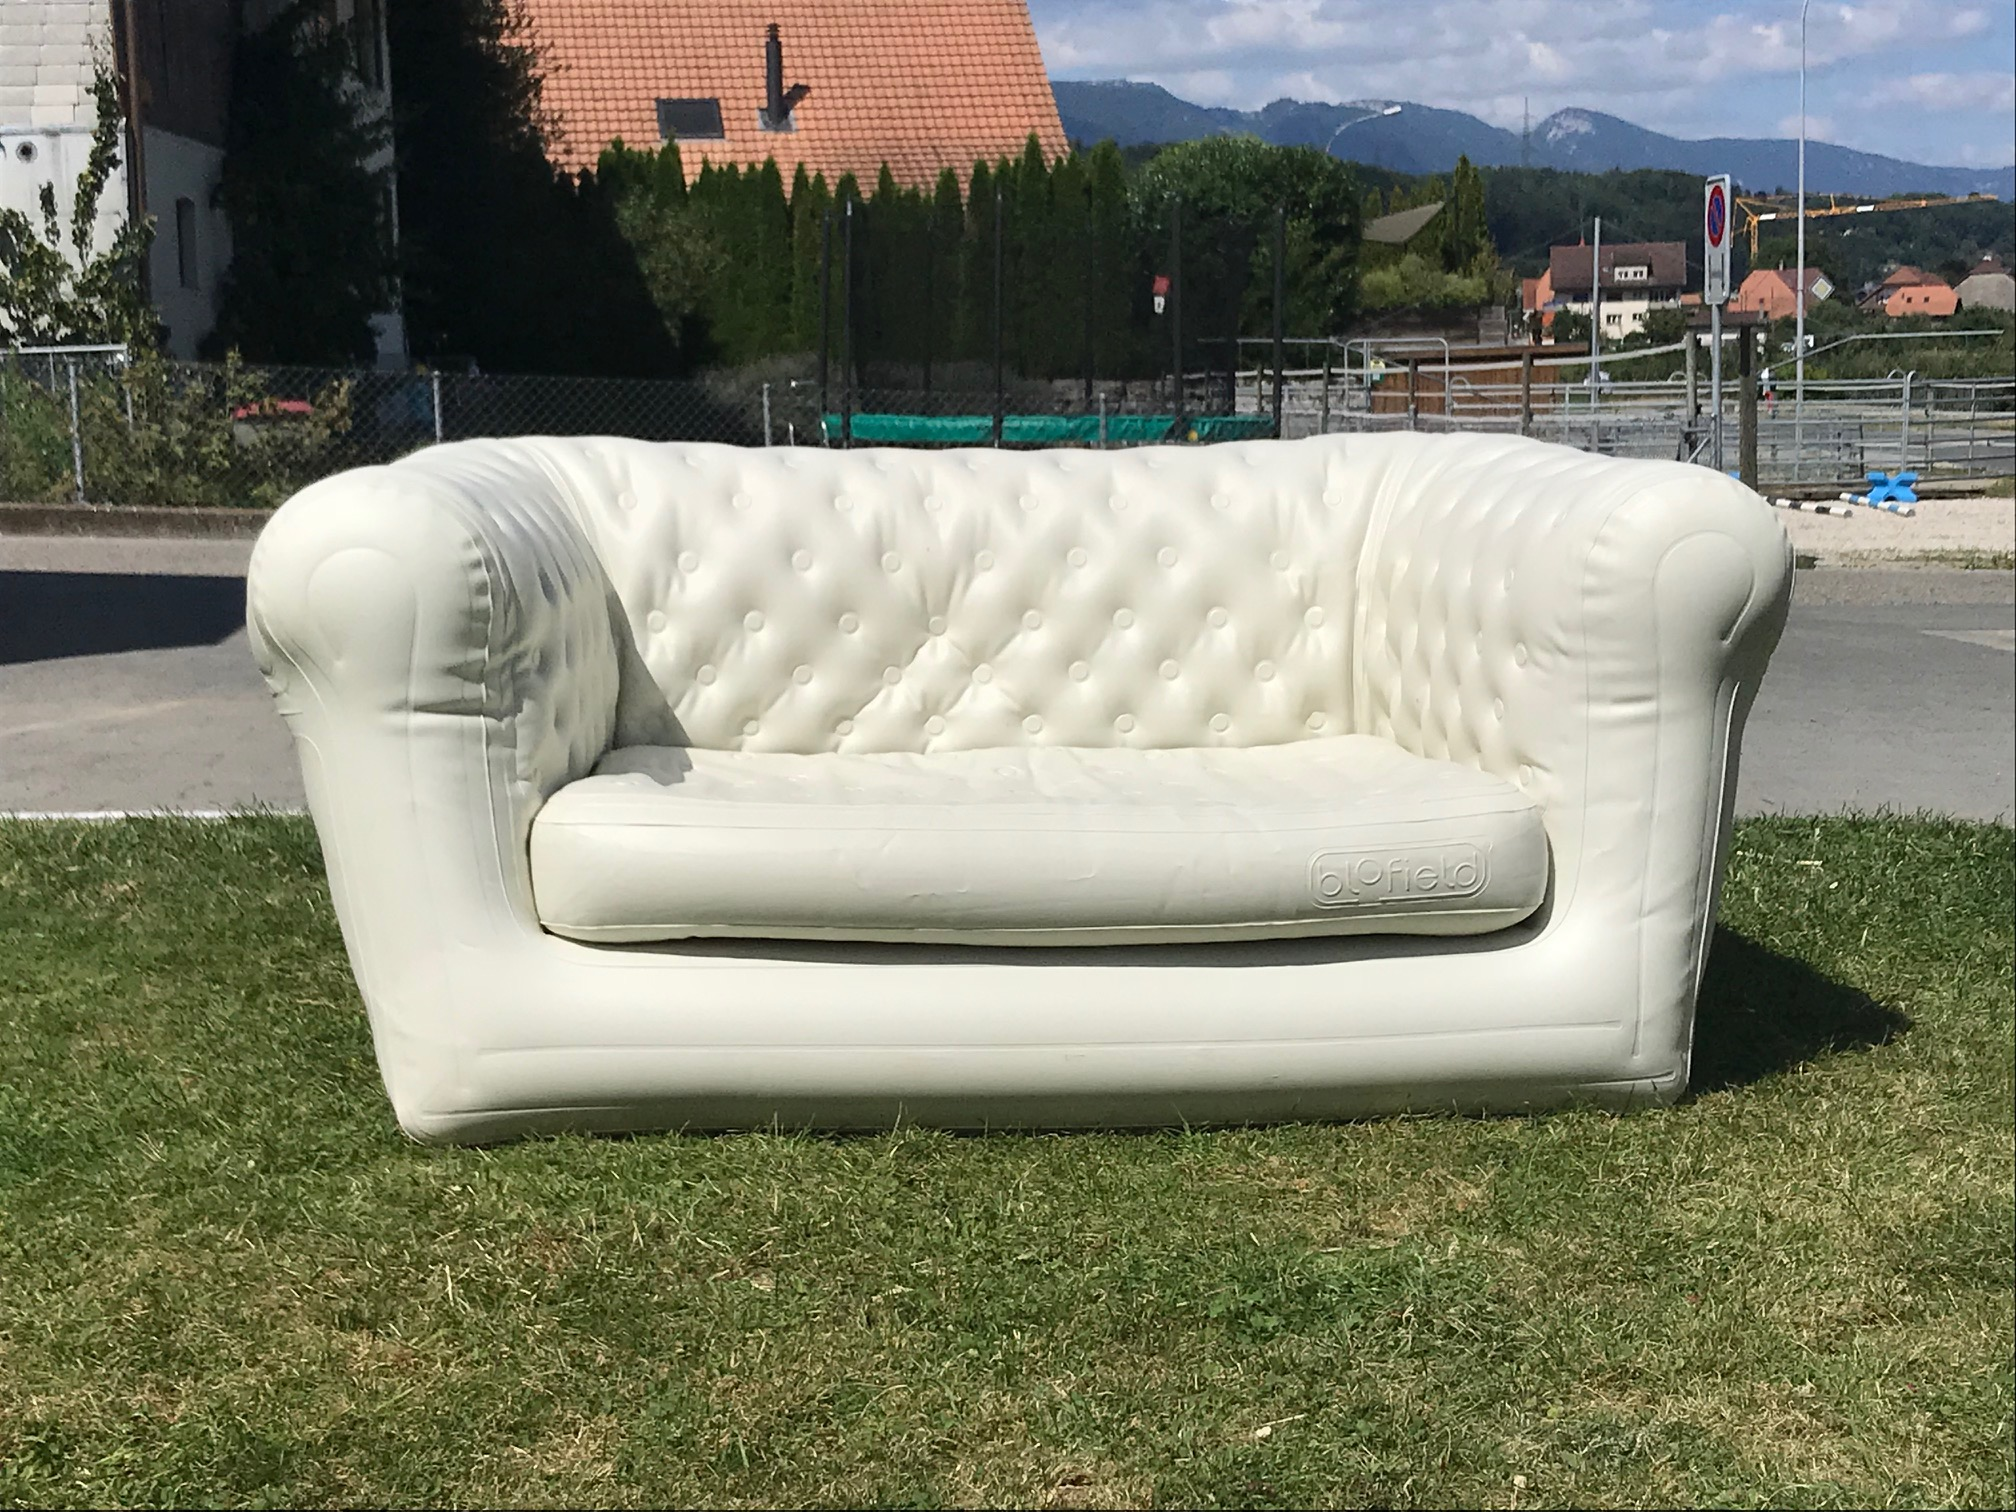 aufblasbares sofa schweiz. Black Bedroom Furniture Sets. Home Design Ideas